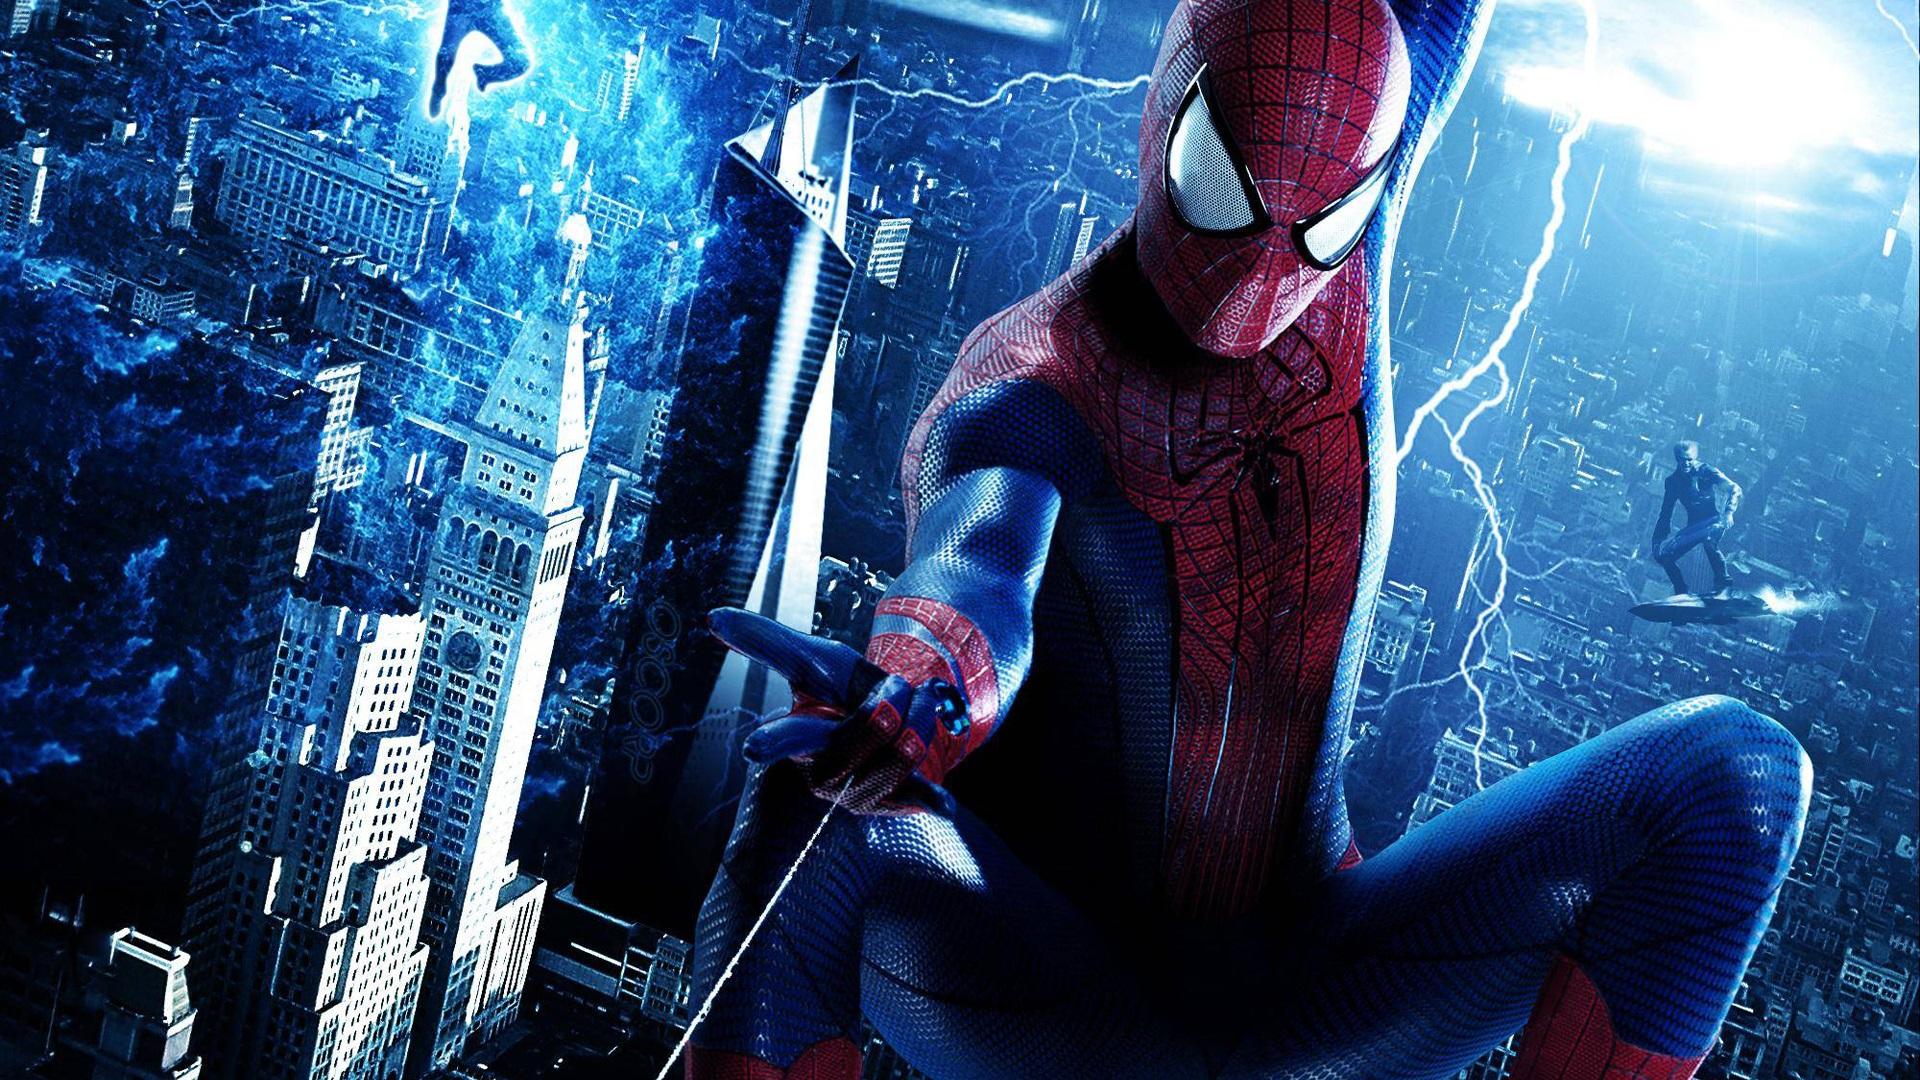 Image Result For Amazing Spider Man Wallpaper Ipad Mini